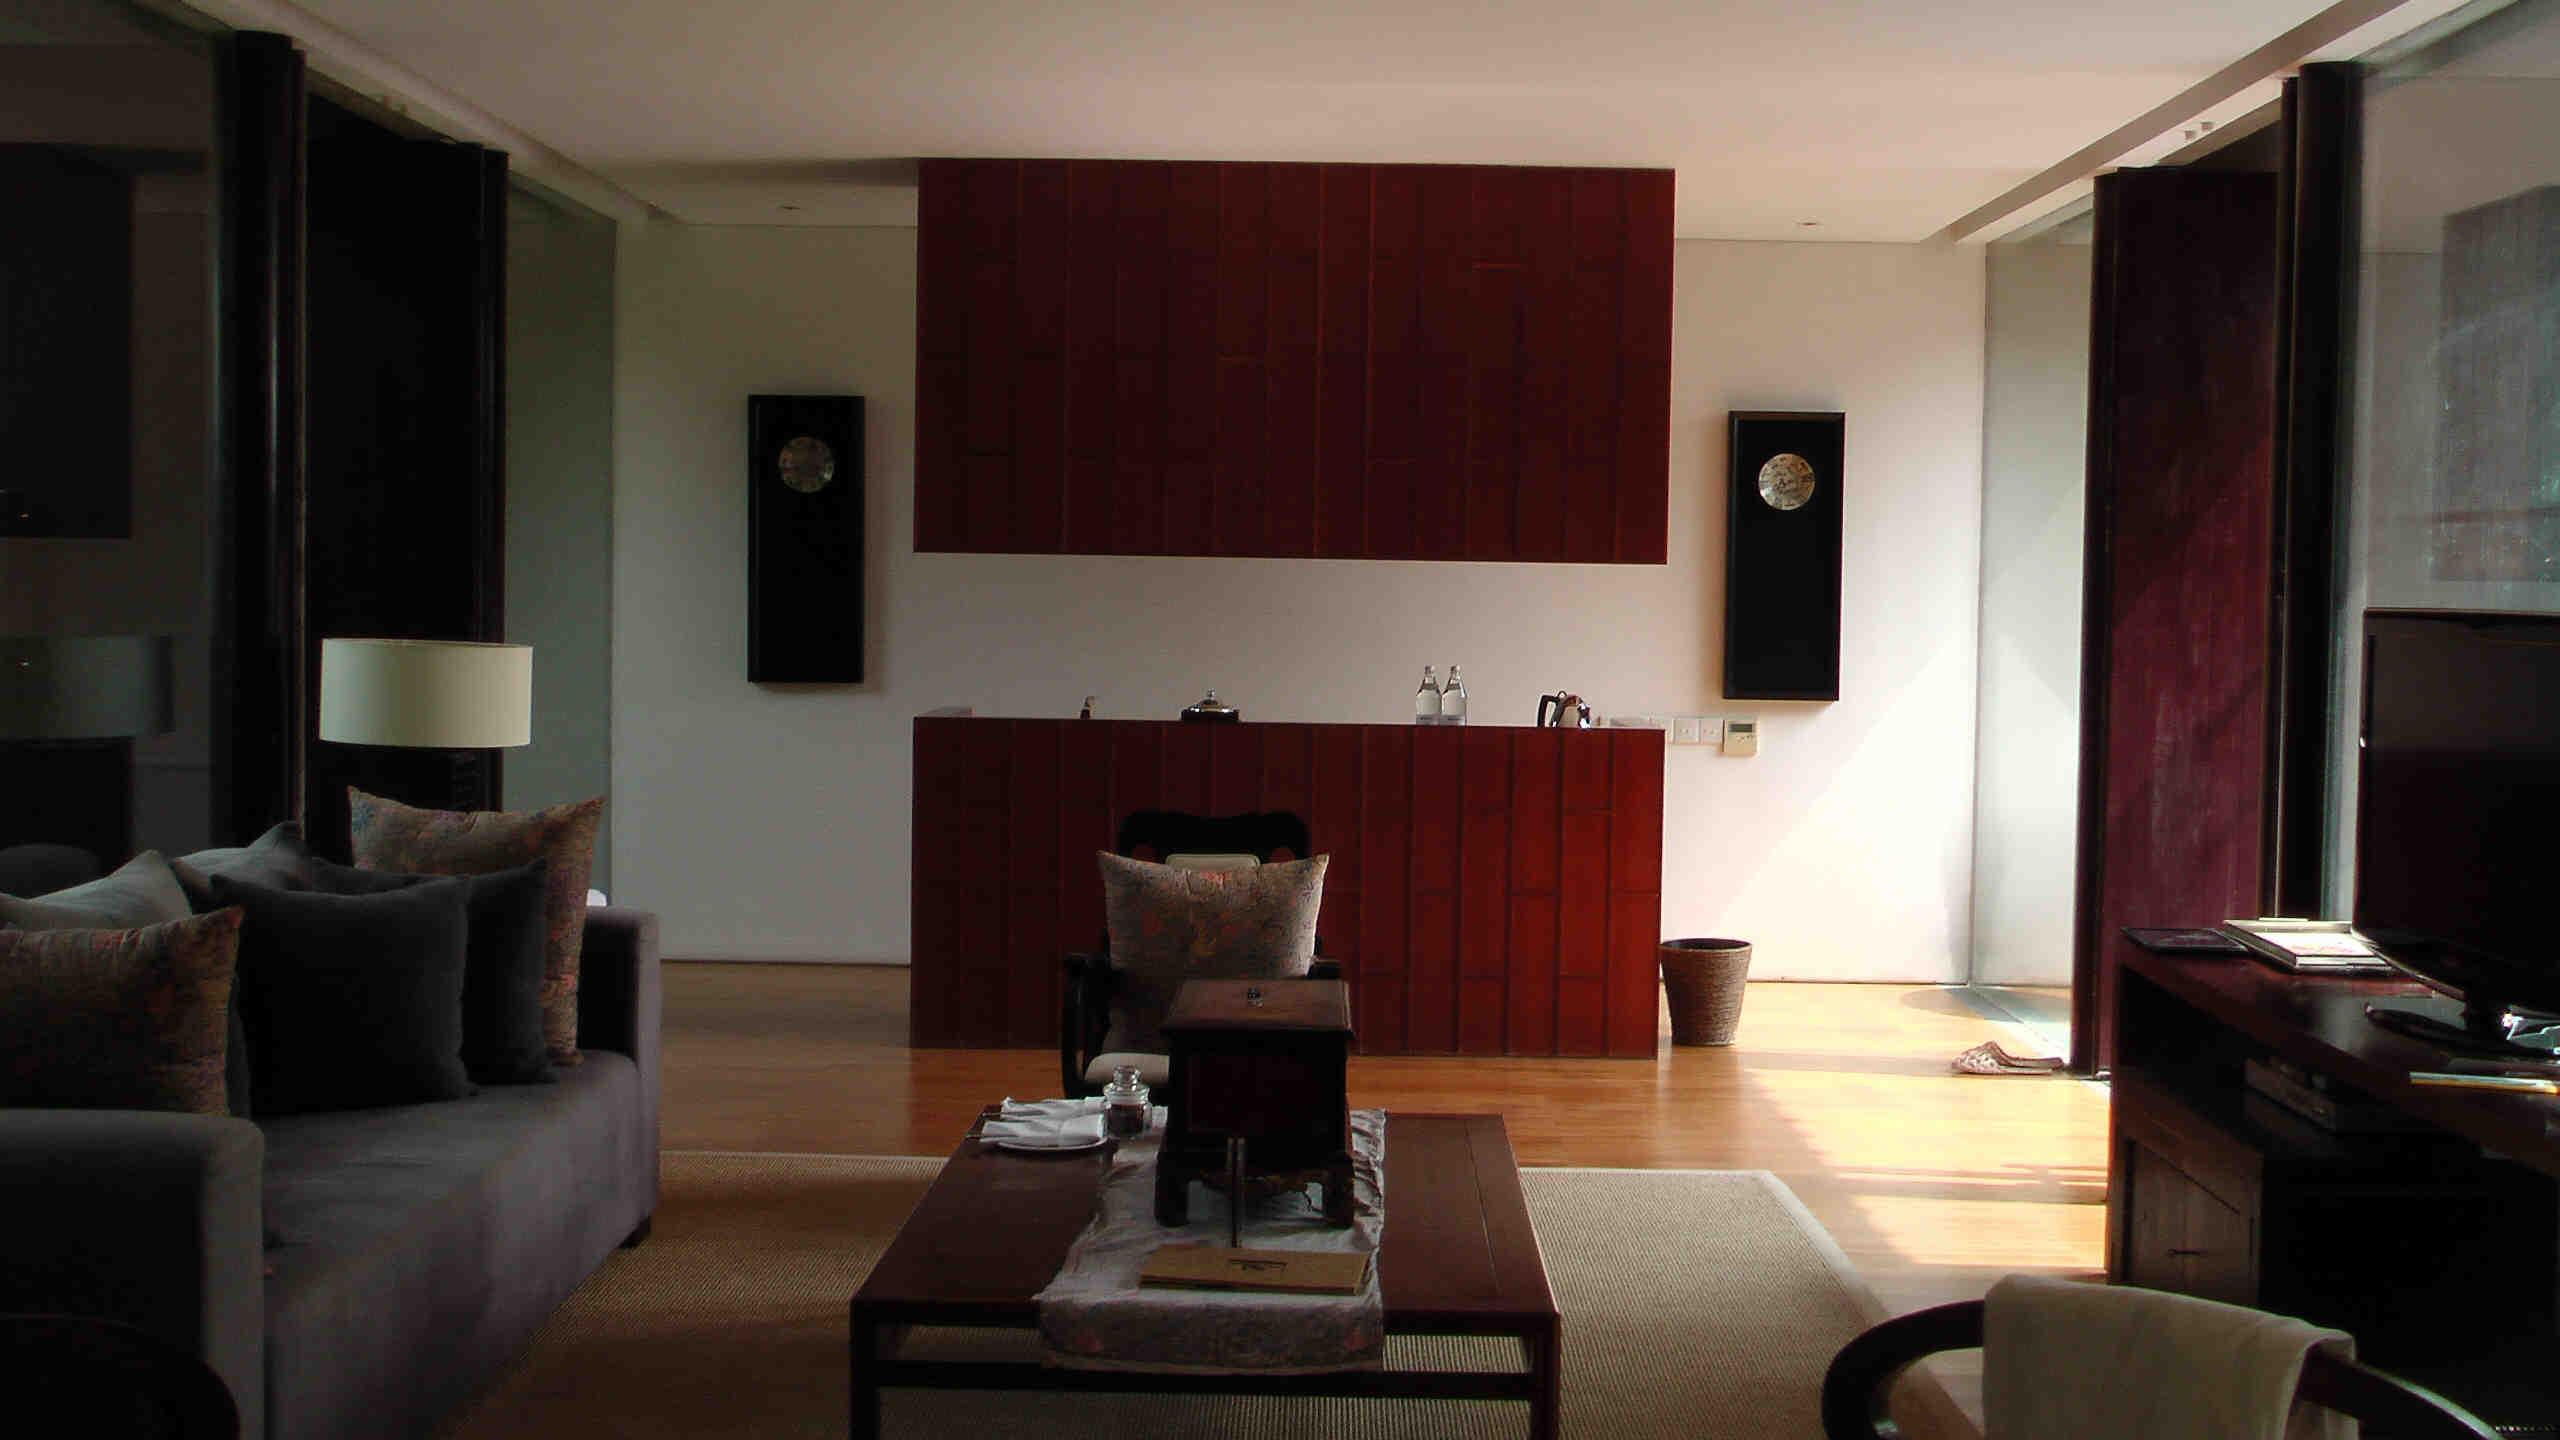 anordnung kche anordnung kche with anordnung kche good fr kche design und kche kchen design. Black Bedroom Furniture Sets. Home Design Ideas